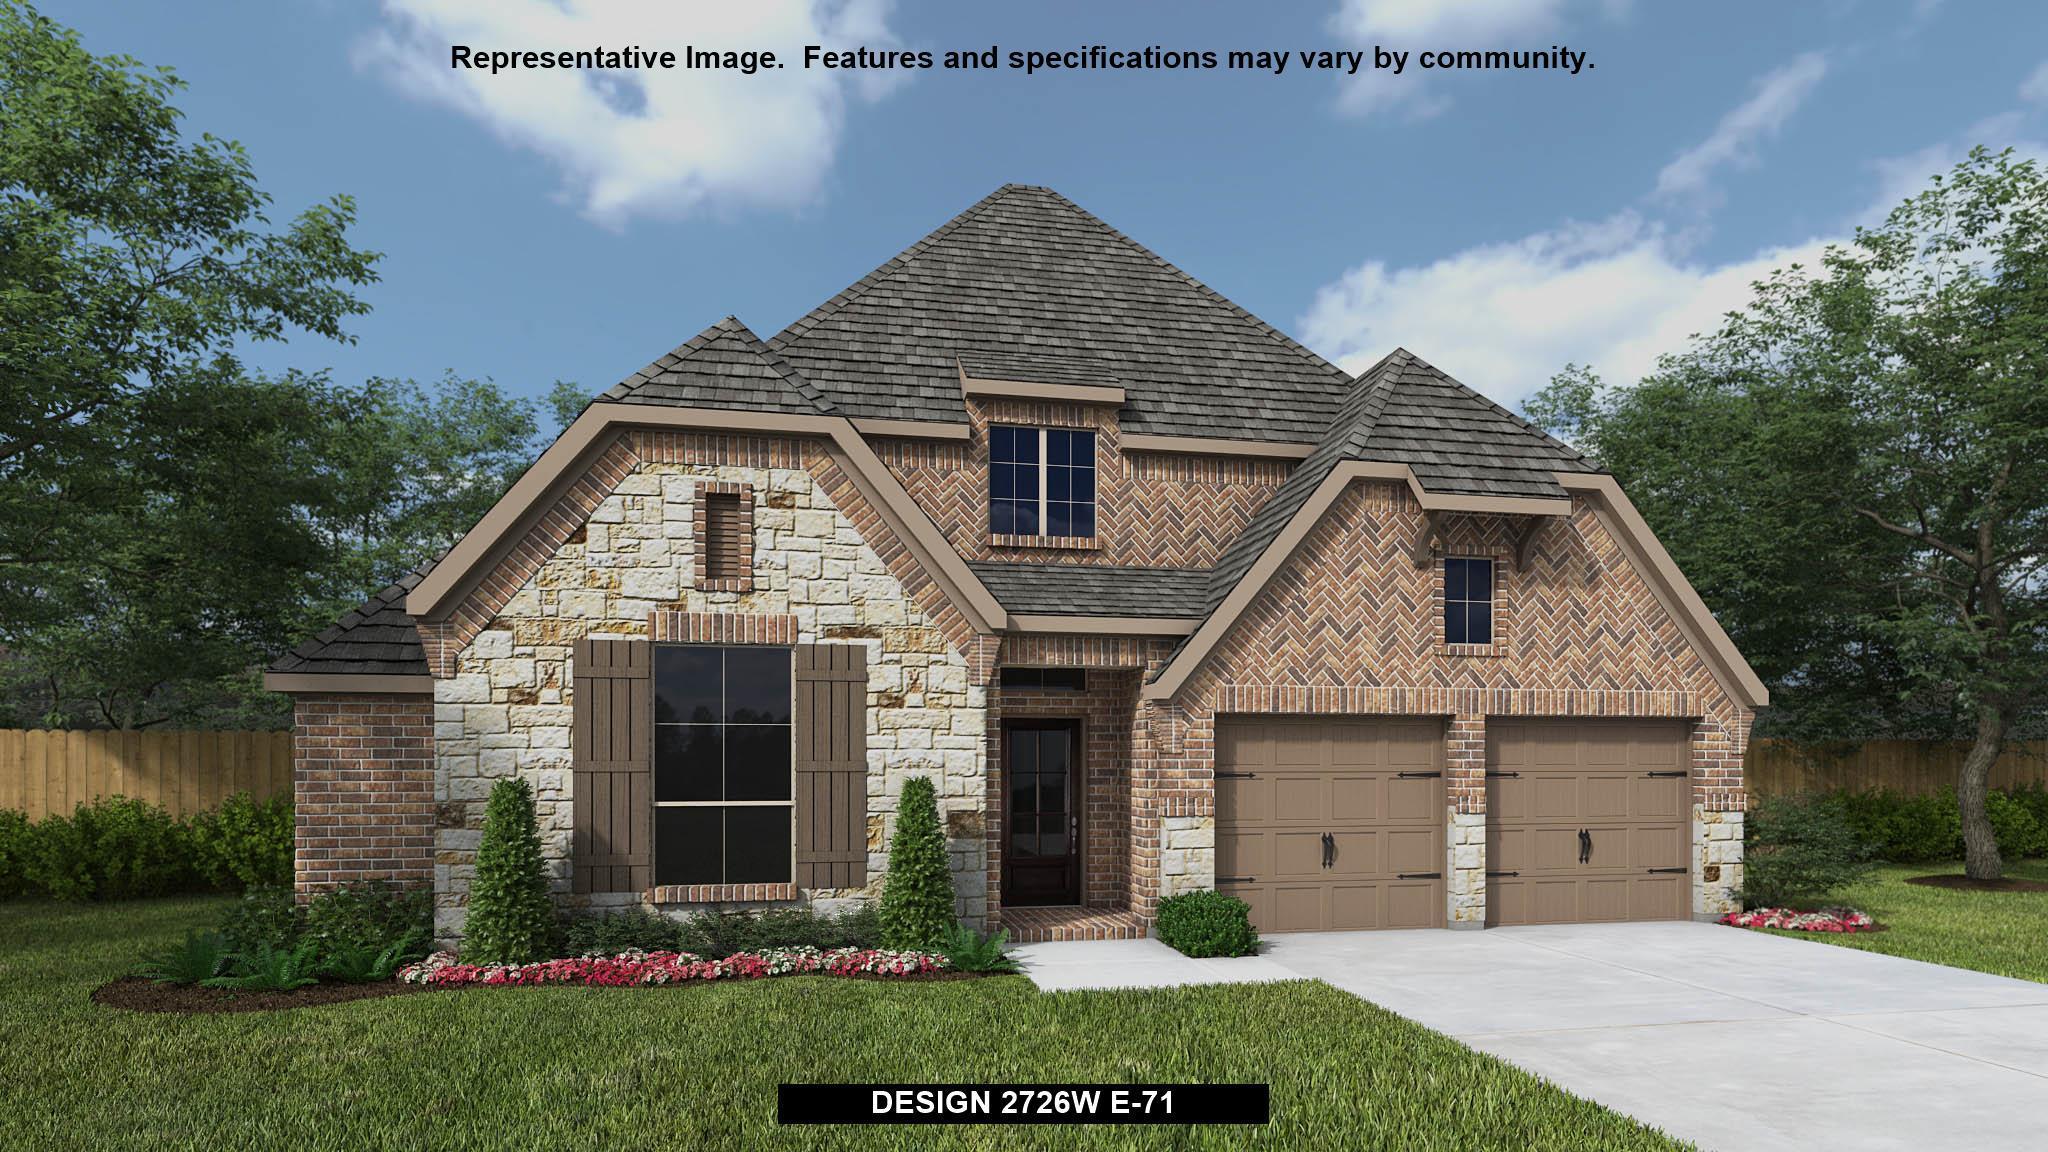 2726W-Design-at-The Village of Mill Creek 60'-in-Seguin